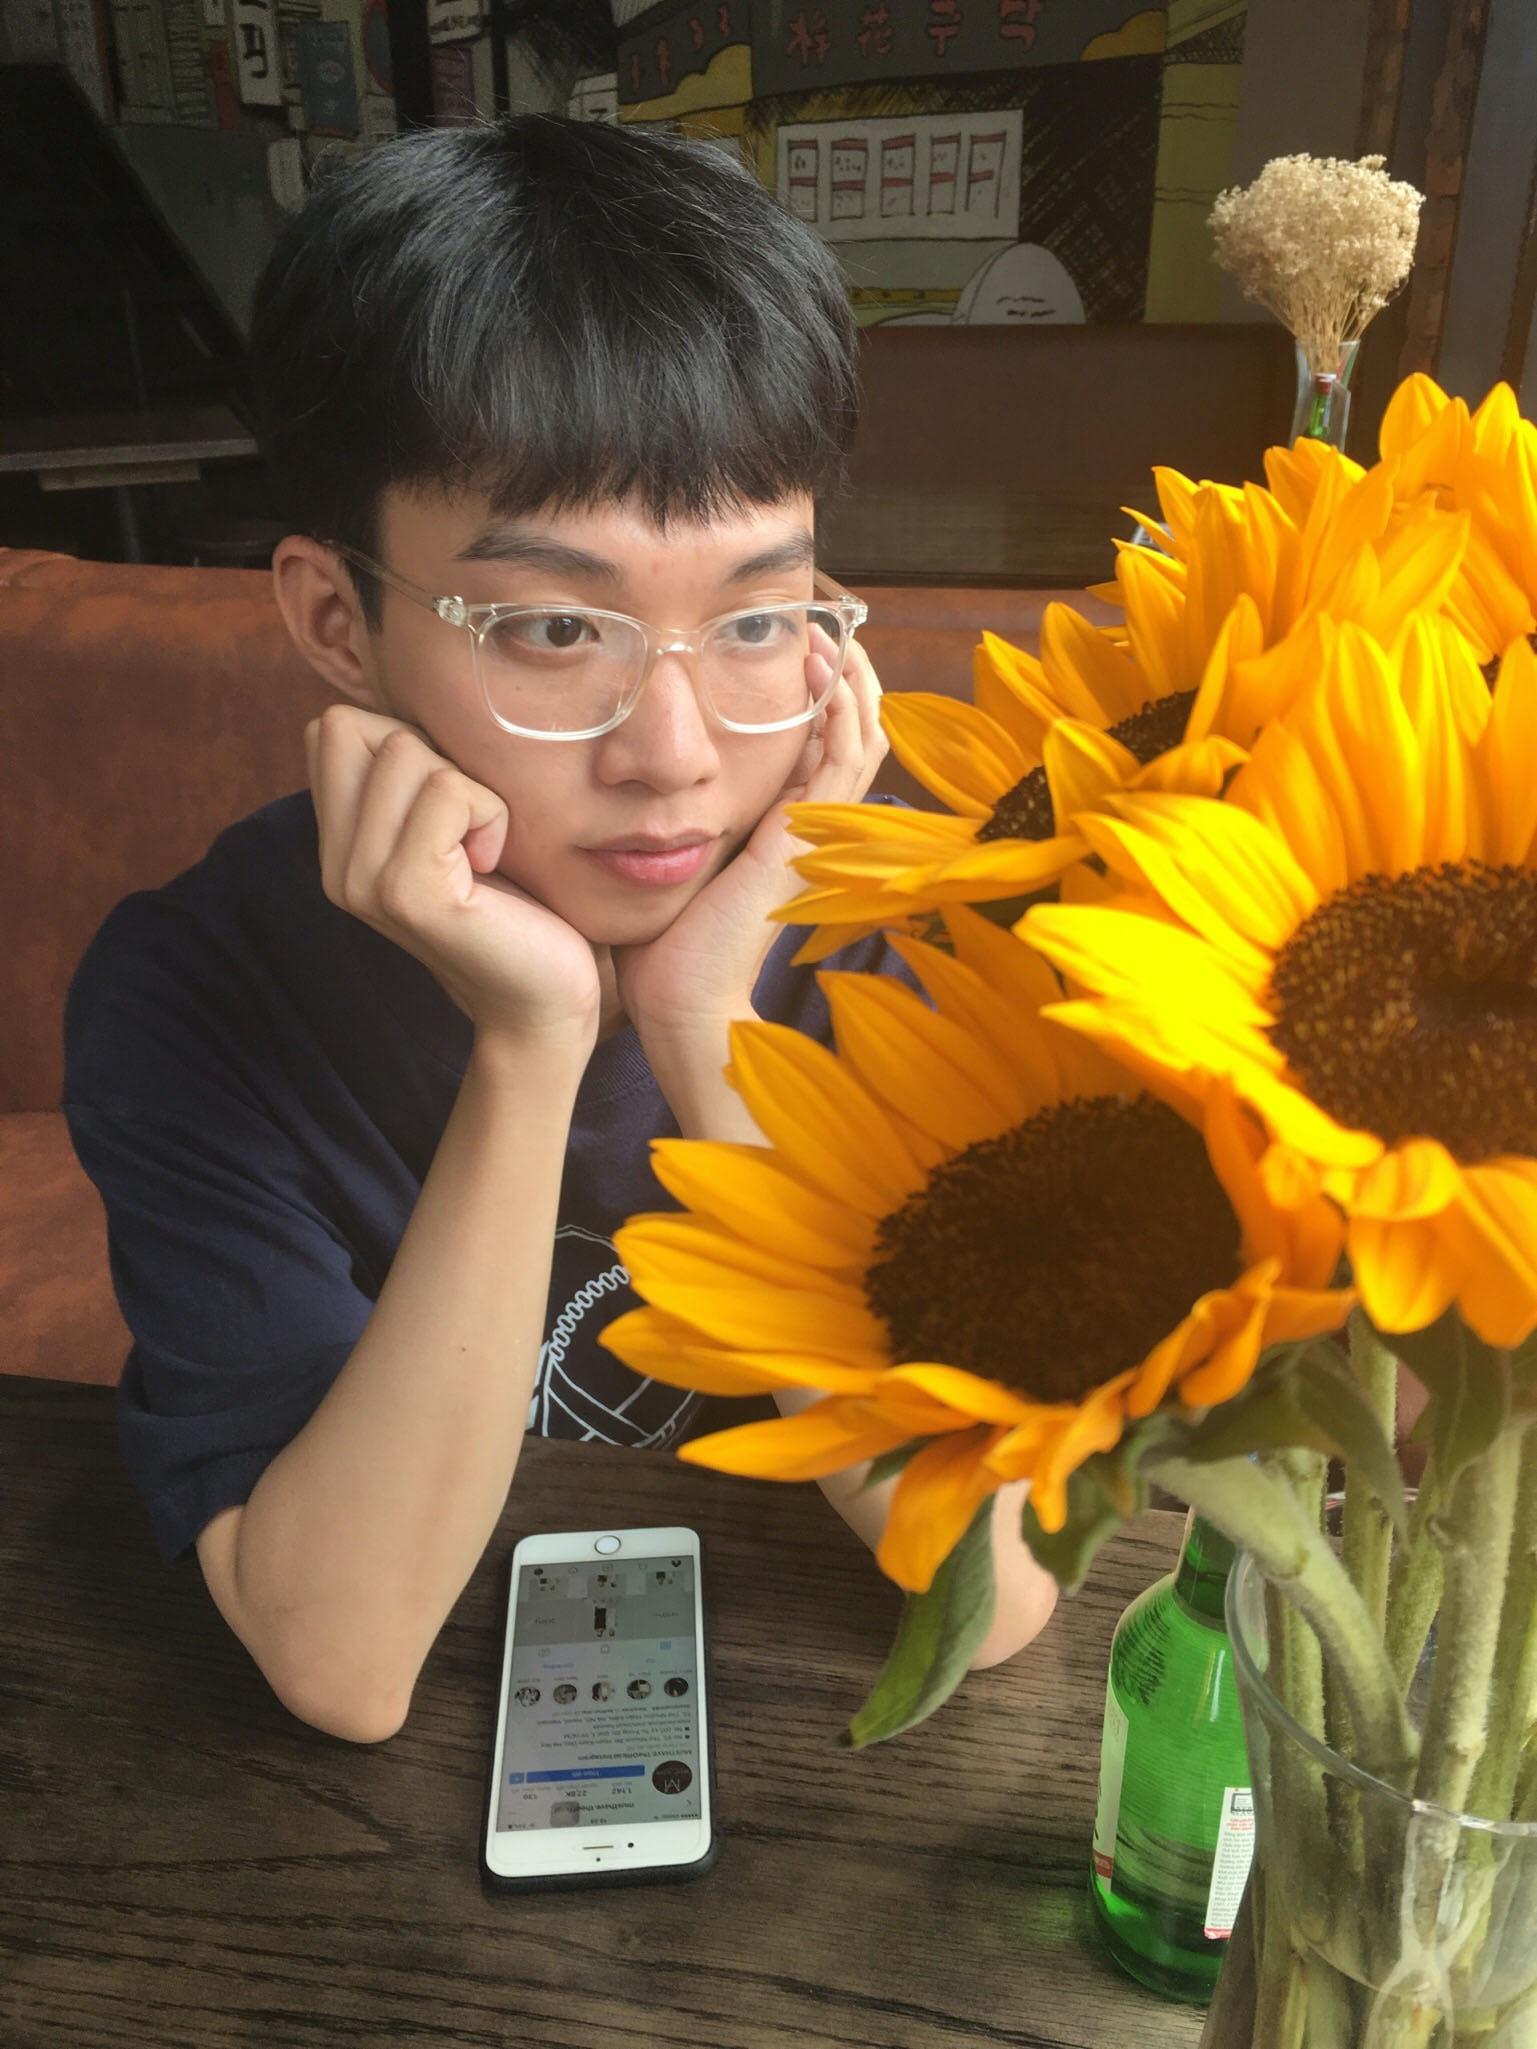 Go to quan tranhoang's profile